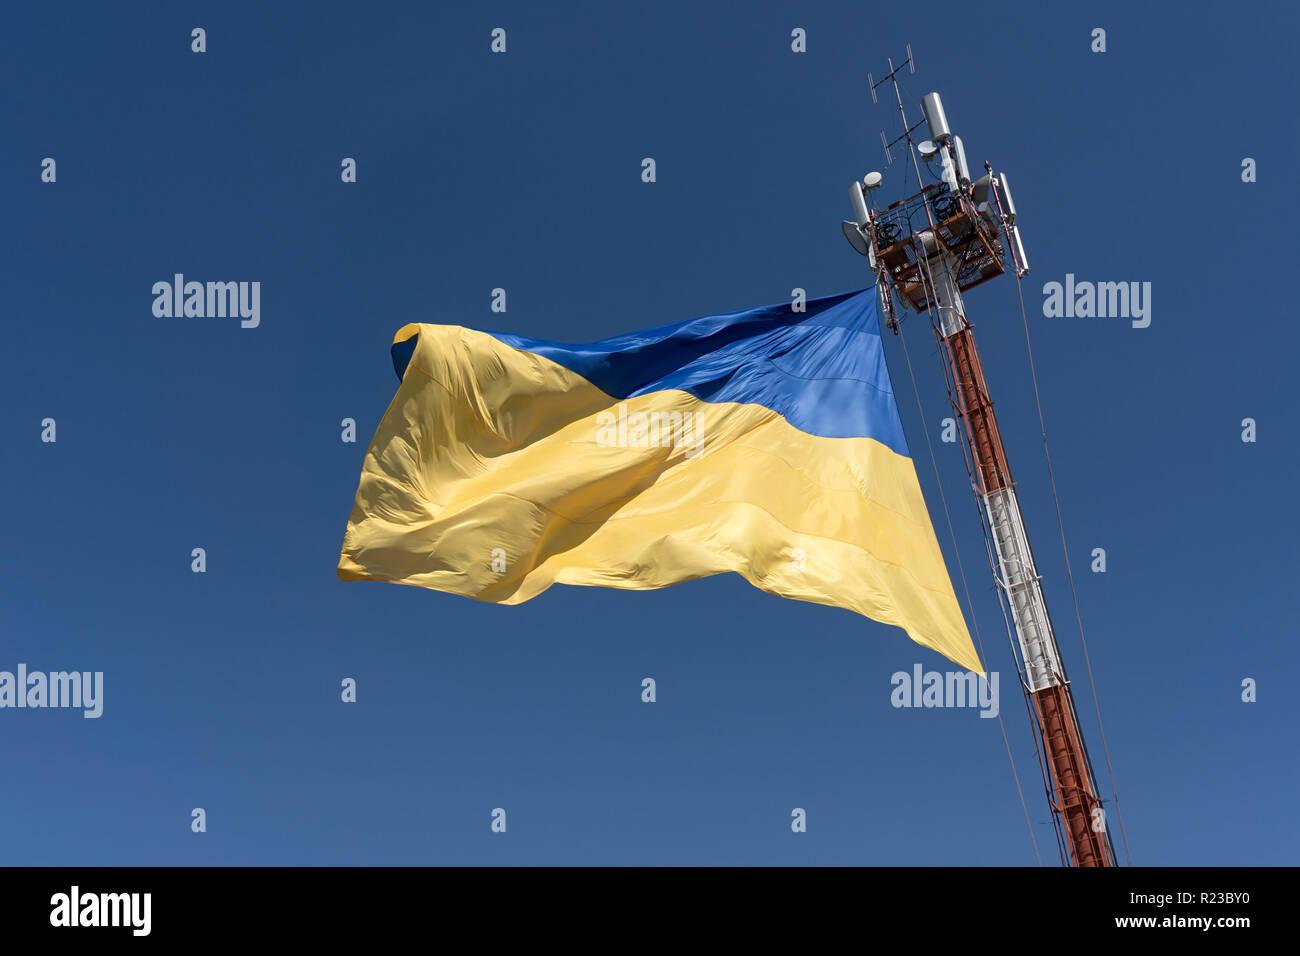 MAYSKE, DNIPROPETROVSK OBLAST / UKRAINE – AUGUST 24, 2018: Open Festival on Ukraine Independence Day 'Vilne Nebo 2018' / 'Free Sky 2018', The big flag - Stock Image